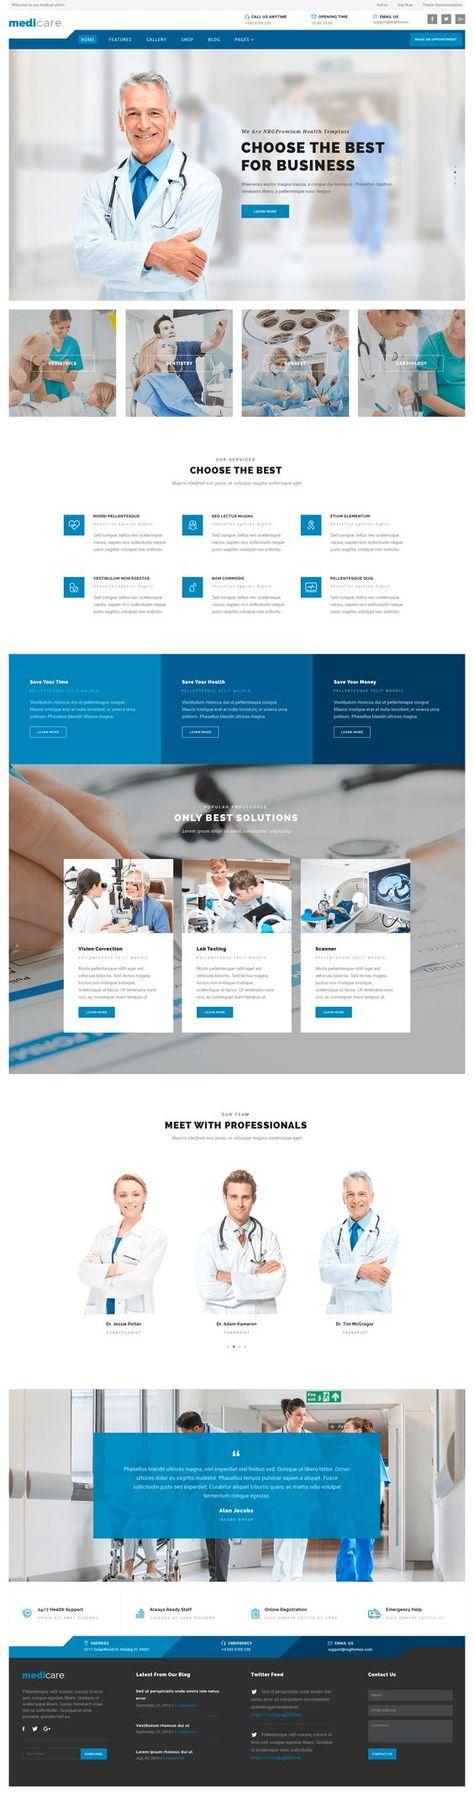 Medical Marketing Los Angeles   Brandinglosangeles.com